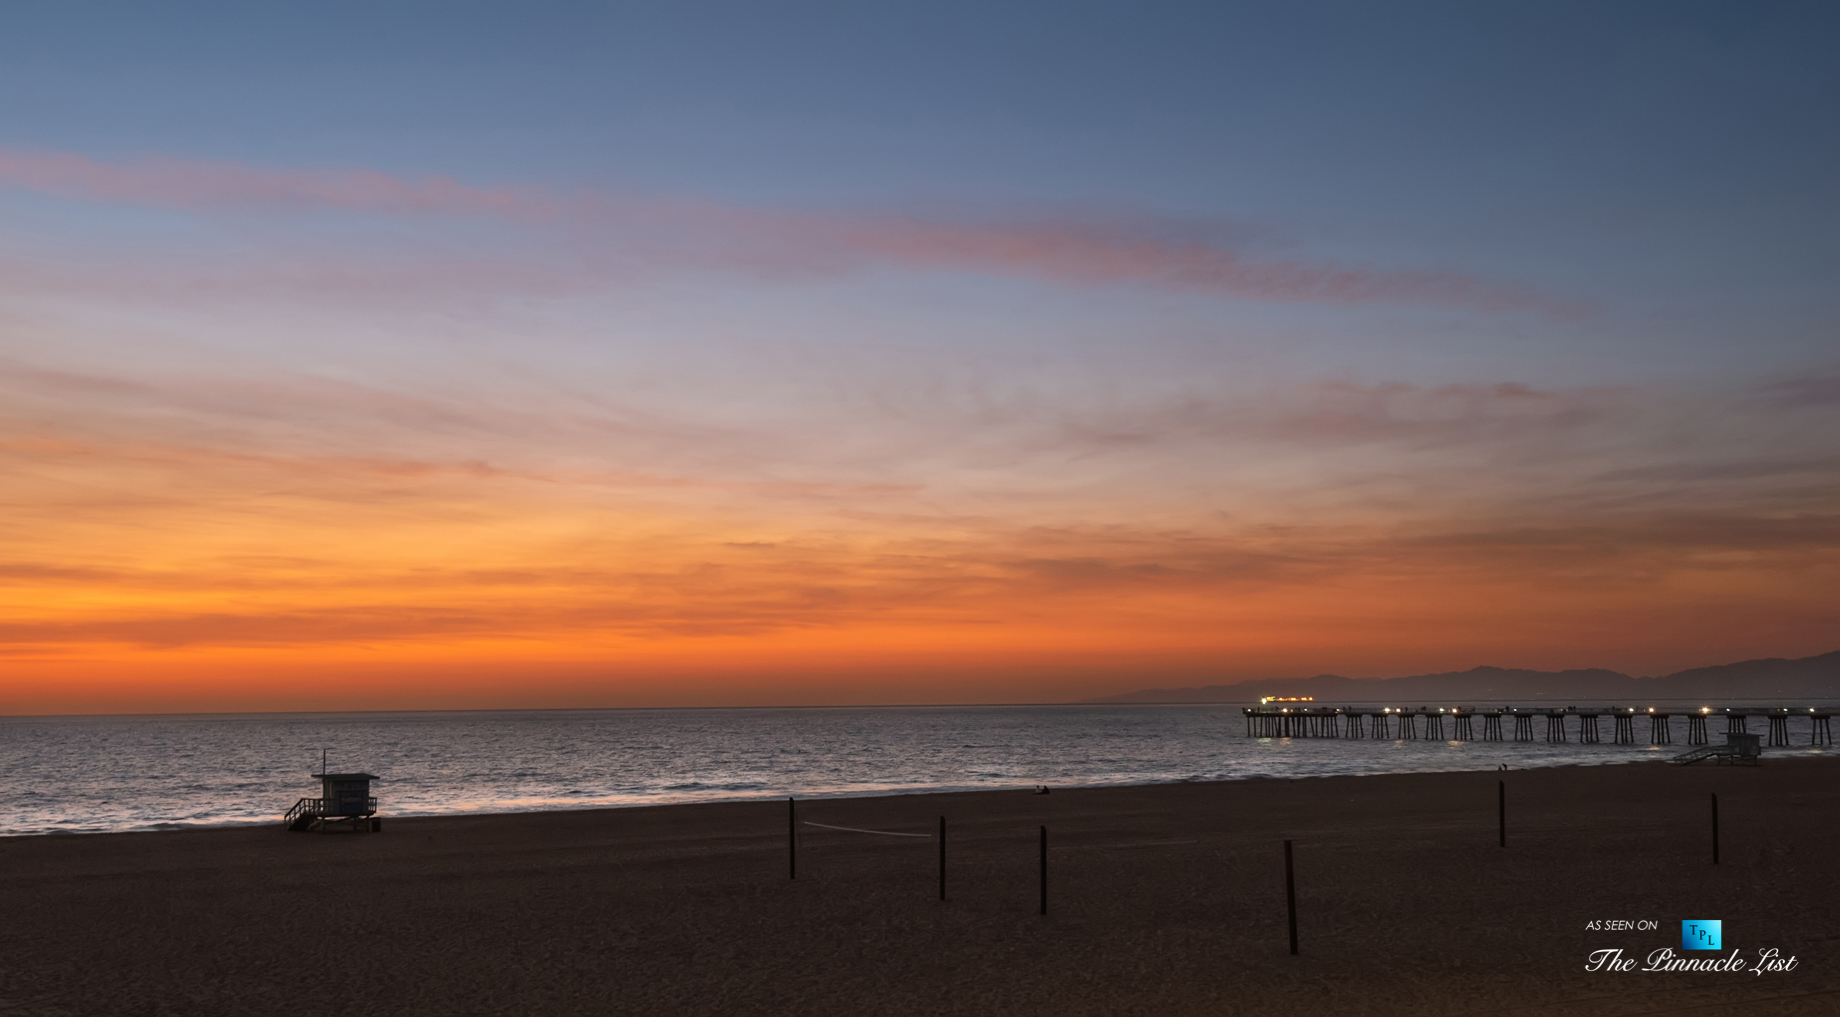 732 The Strand, Hermosa Beach, CA, USA - Sunset Oceanview